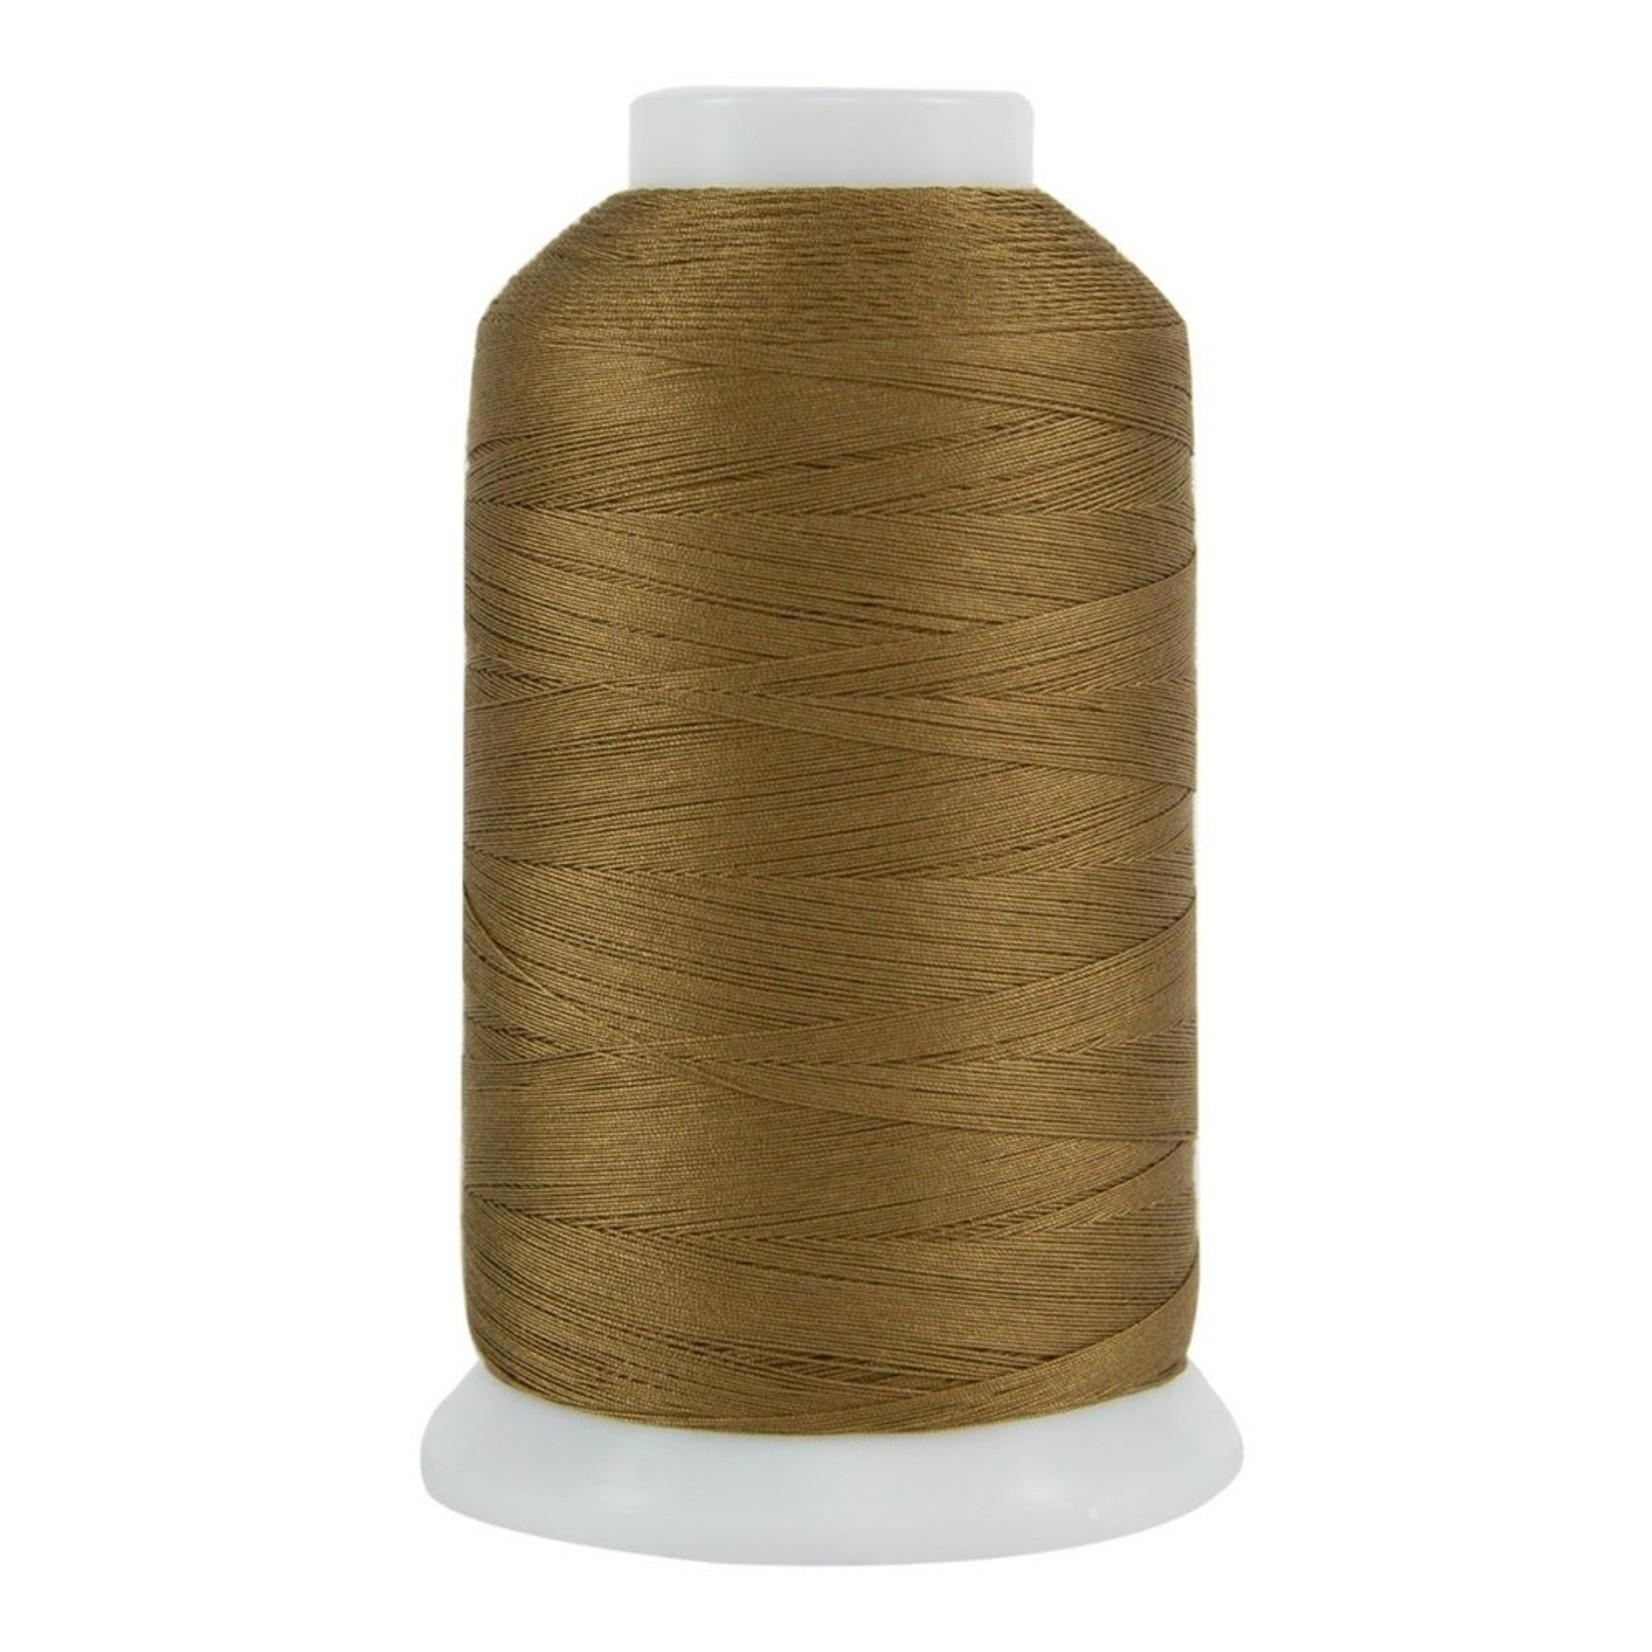 Superior Threads King Tut - #40 - 1828 m - 1017 Brazil Nut